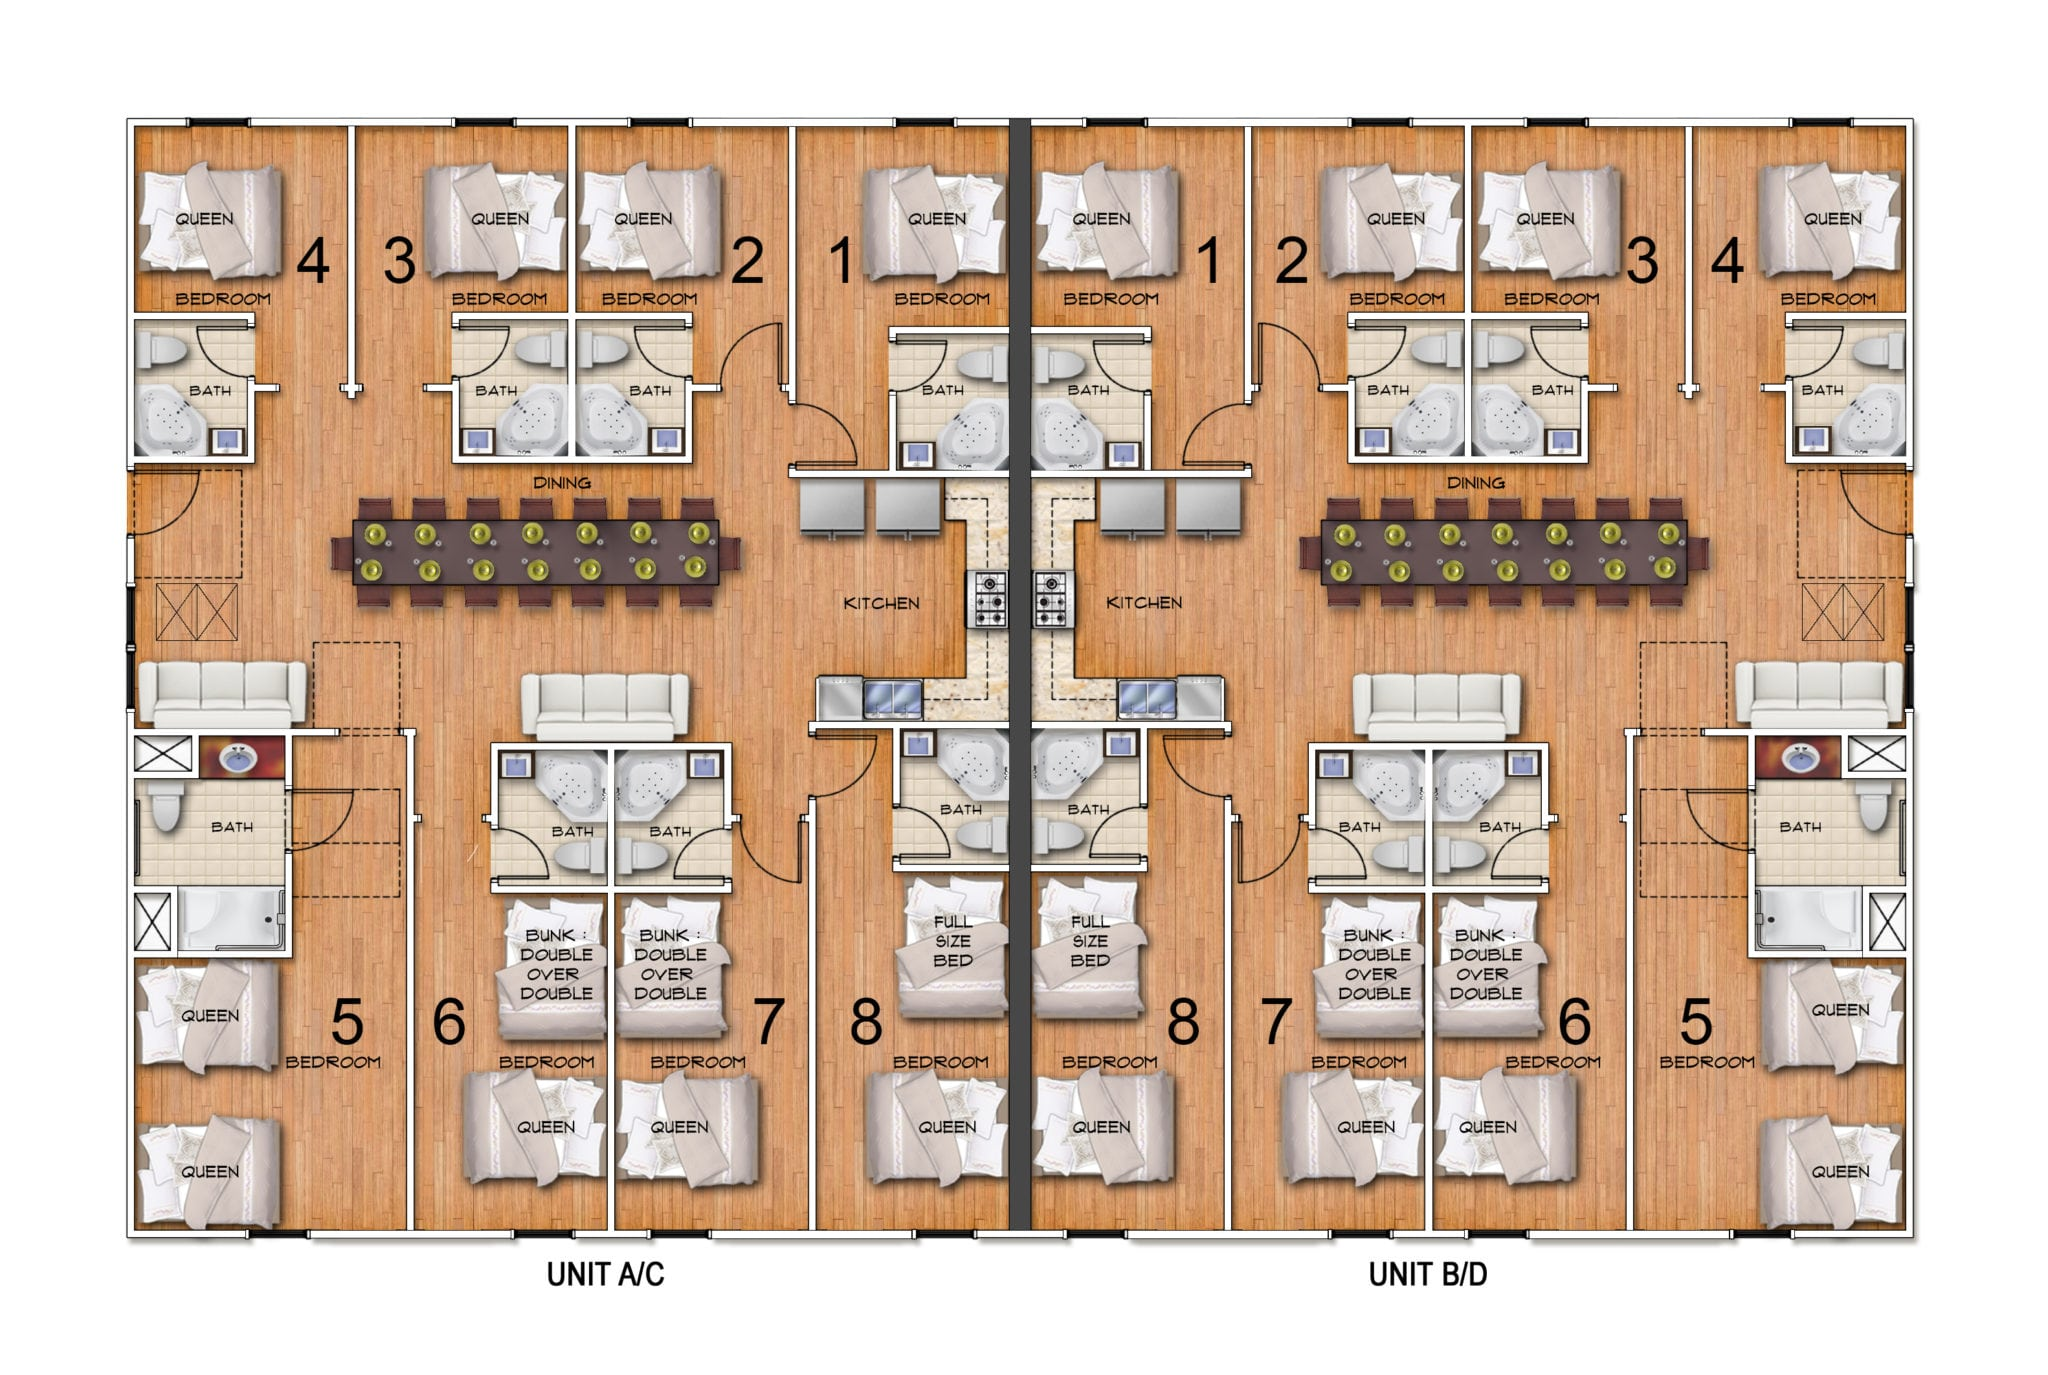 407 9th Avenue - floor plan